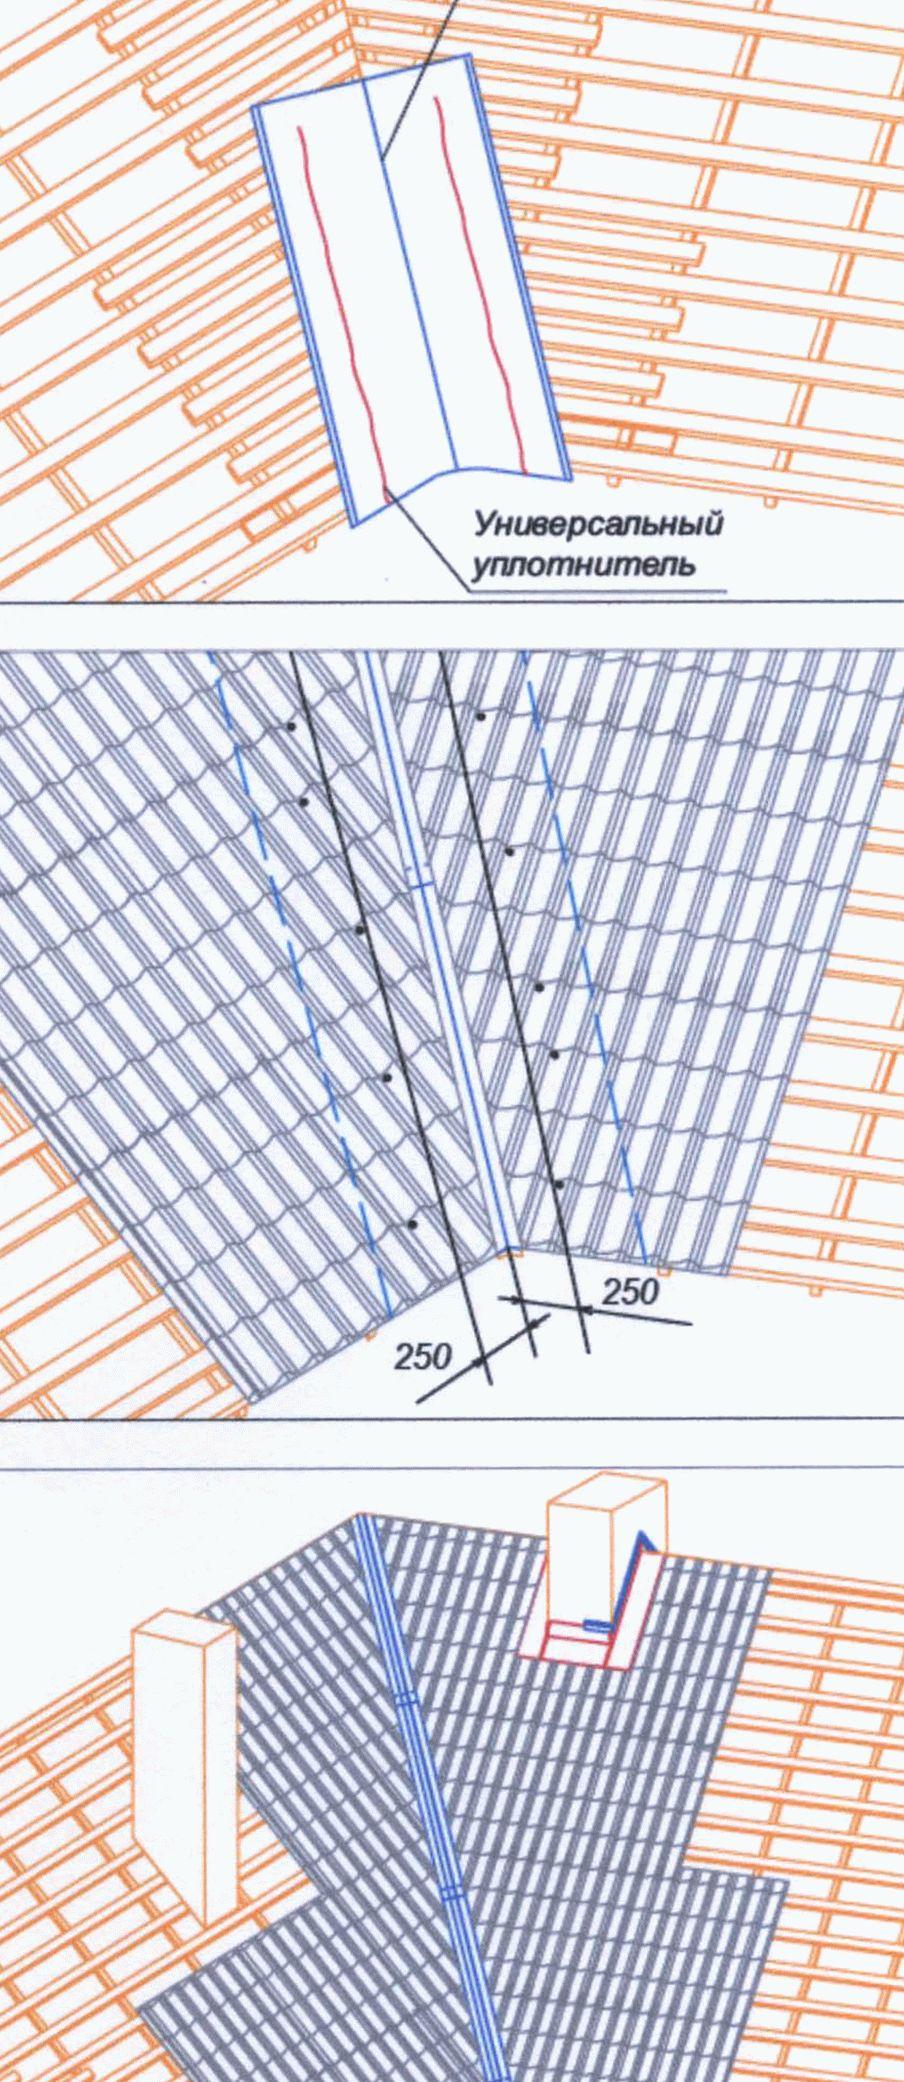 Покрытие крыши металлочерепицей